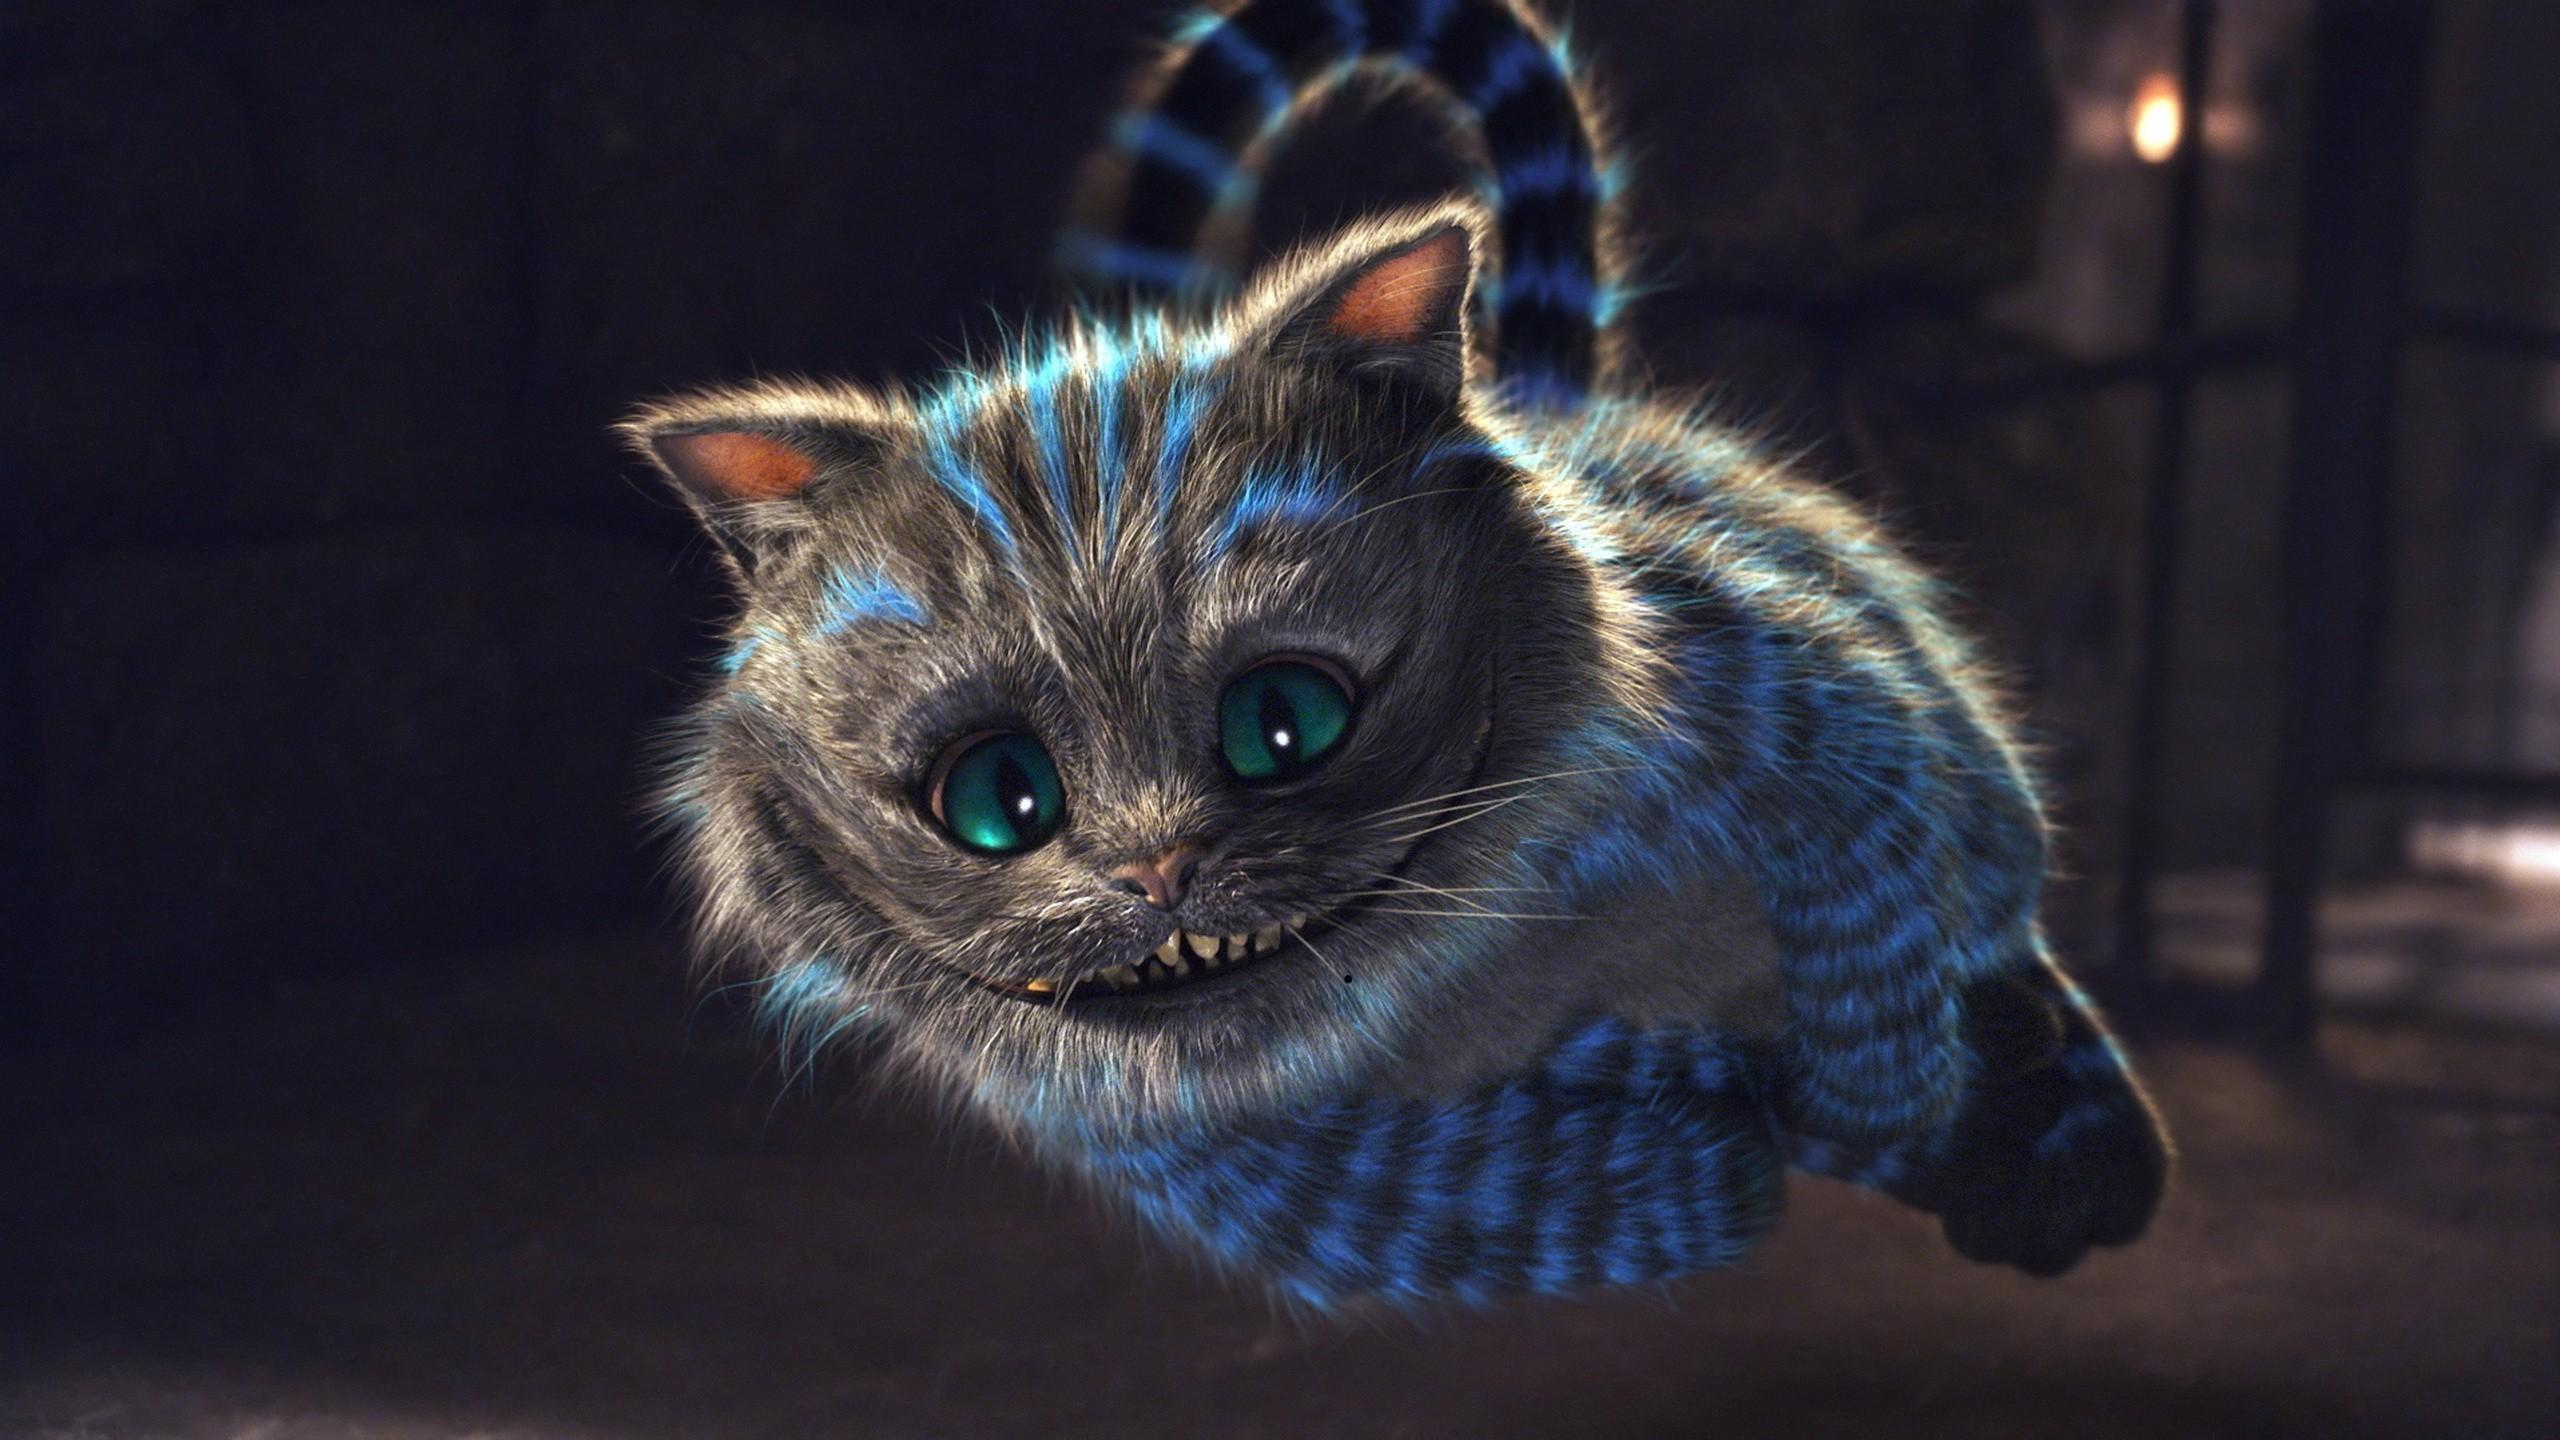 Top Wallpaper Macbook Cat - cheshire-cat  HD_593593.jpg